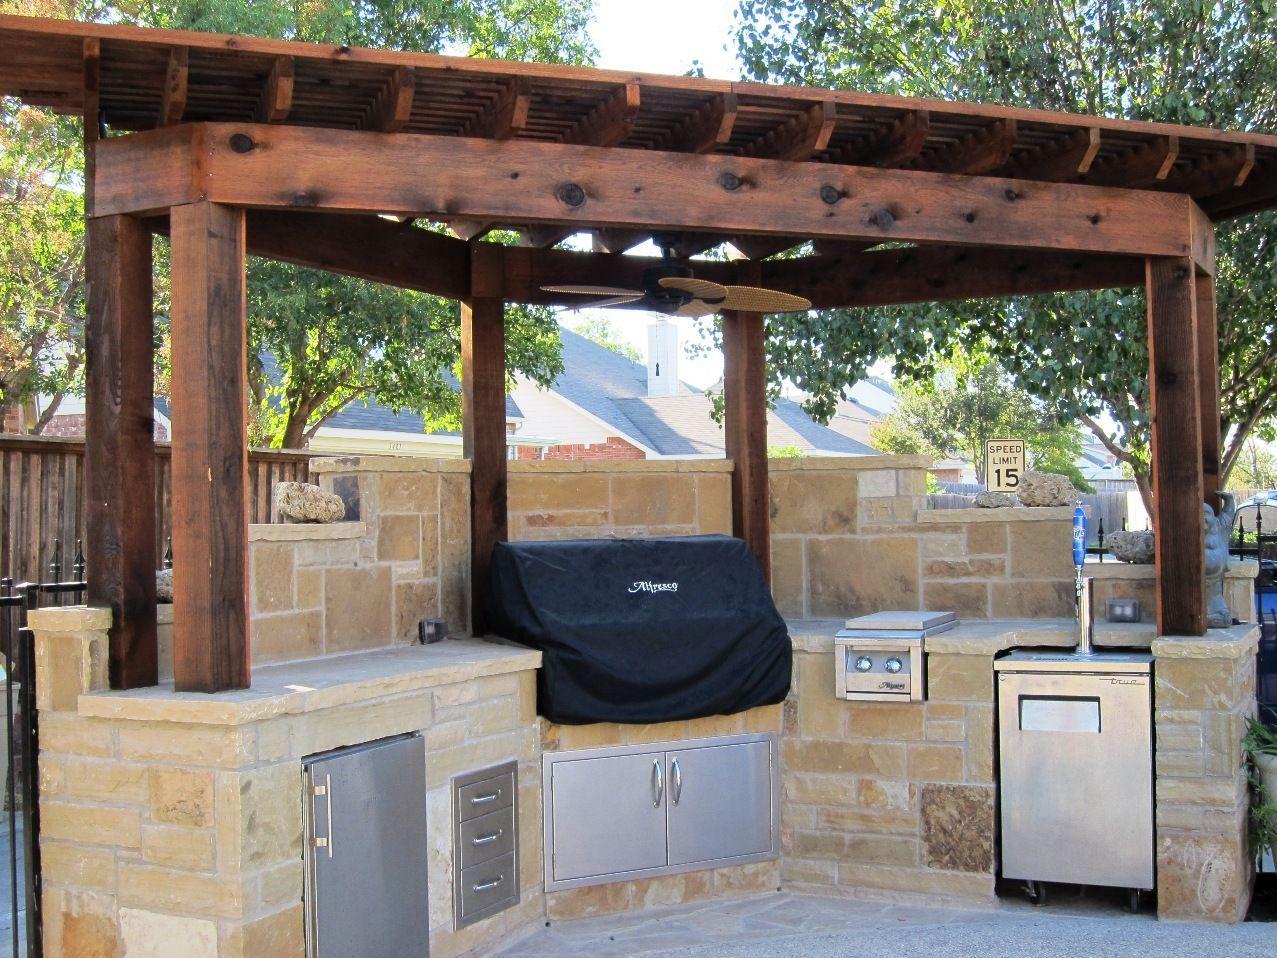 Pergolas Patio Covers In Dallas Tx Dallasoutdoorkitchens Com With Images Outdoor Kitchen Countertops